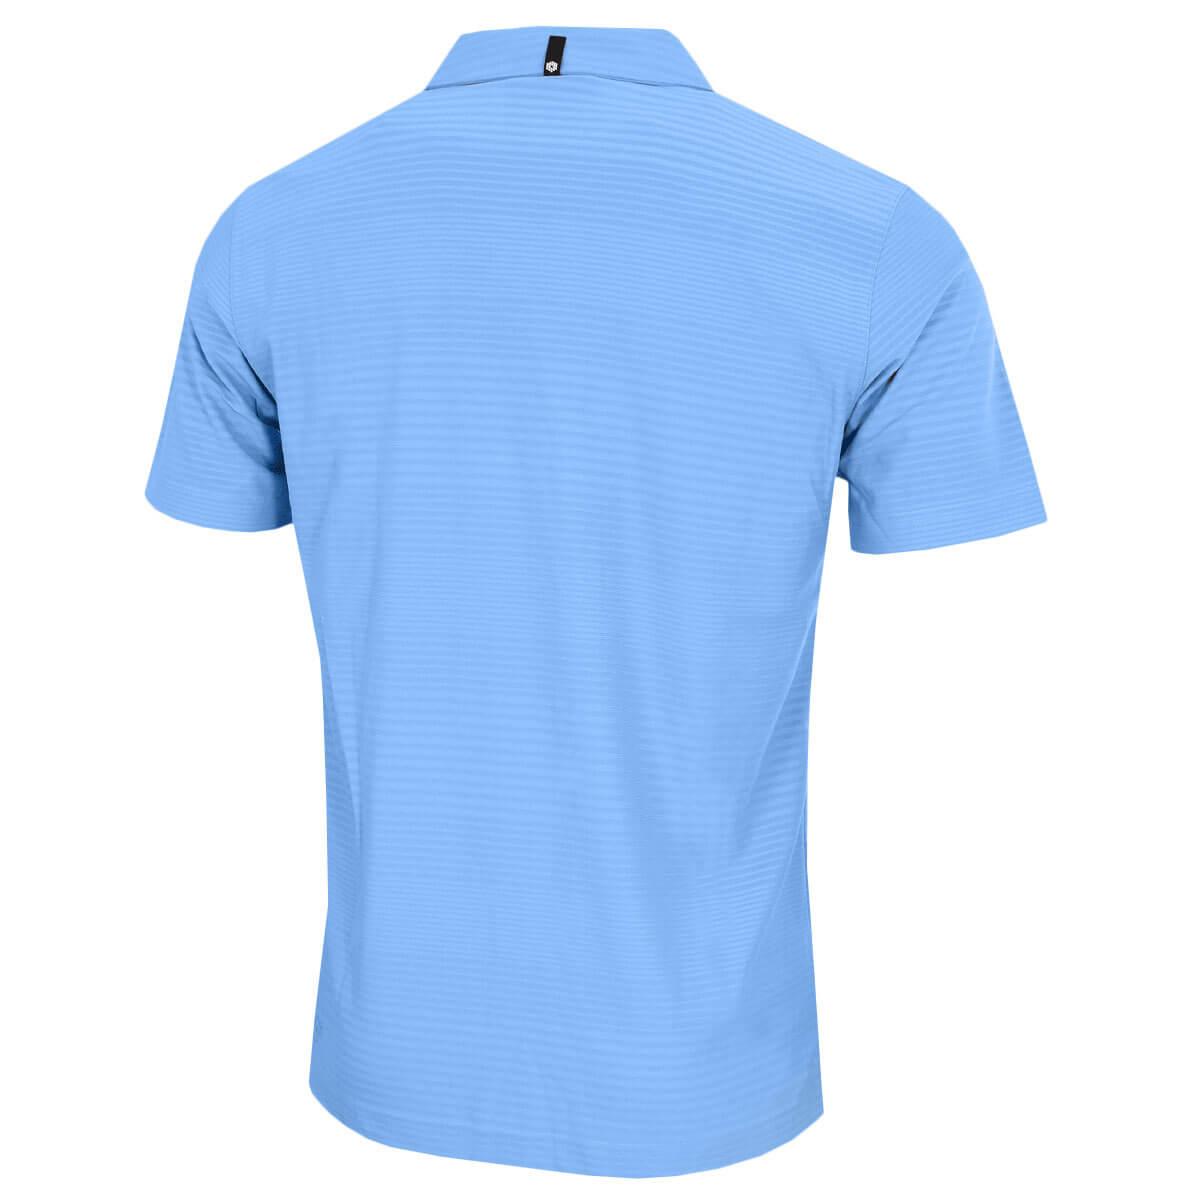 Puma-Golf-Mens-Aston-DRYCELL-UPF-50-Moisture-Wicking-Polo-Shirt-45-OFF-RRP thumbnail 6